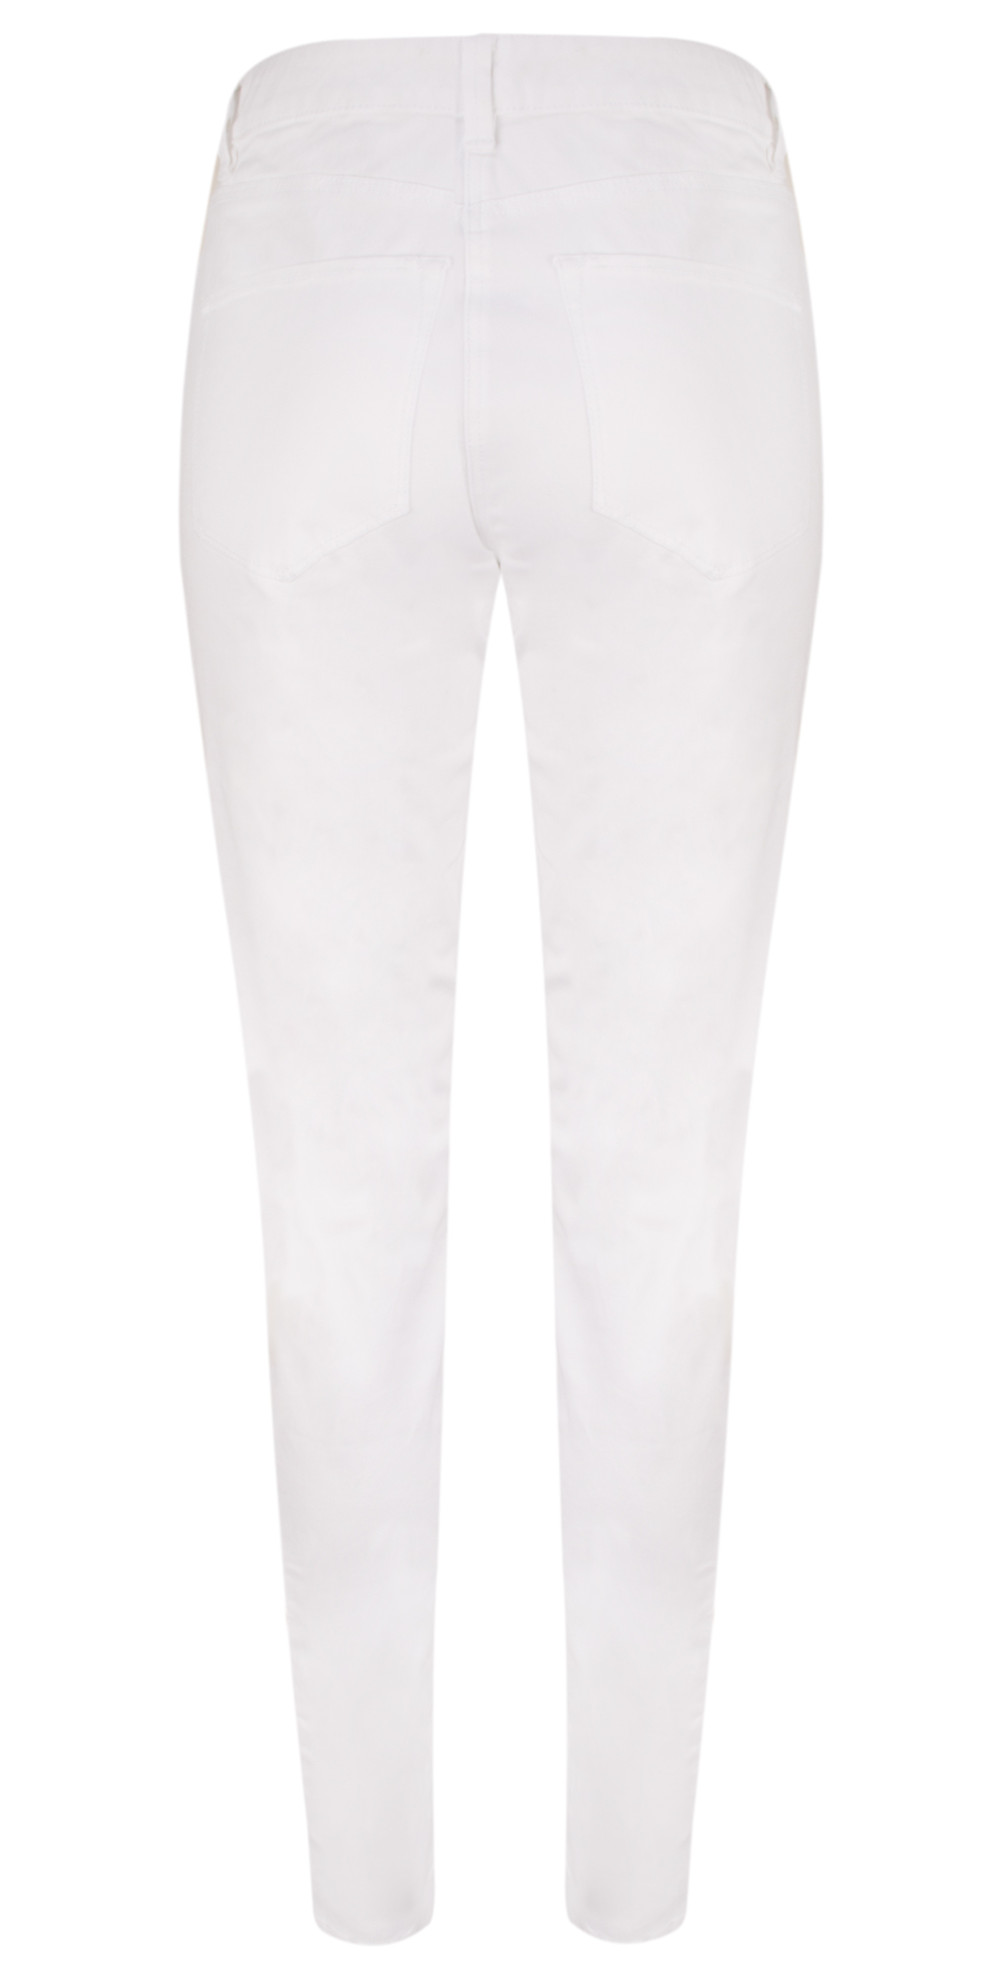 Essentials Highwaist Skinny Pants main image